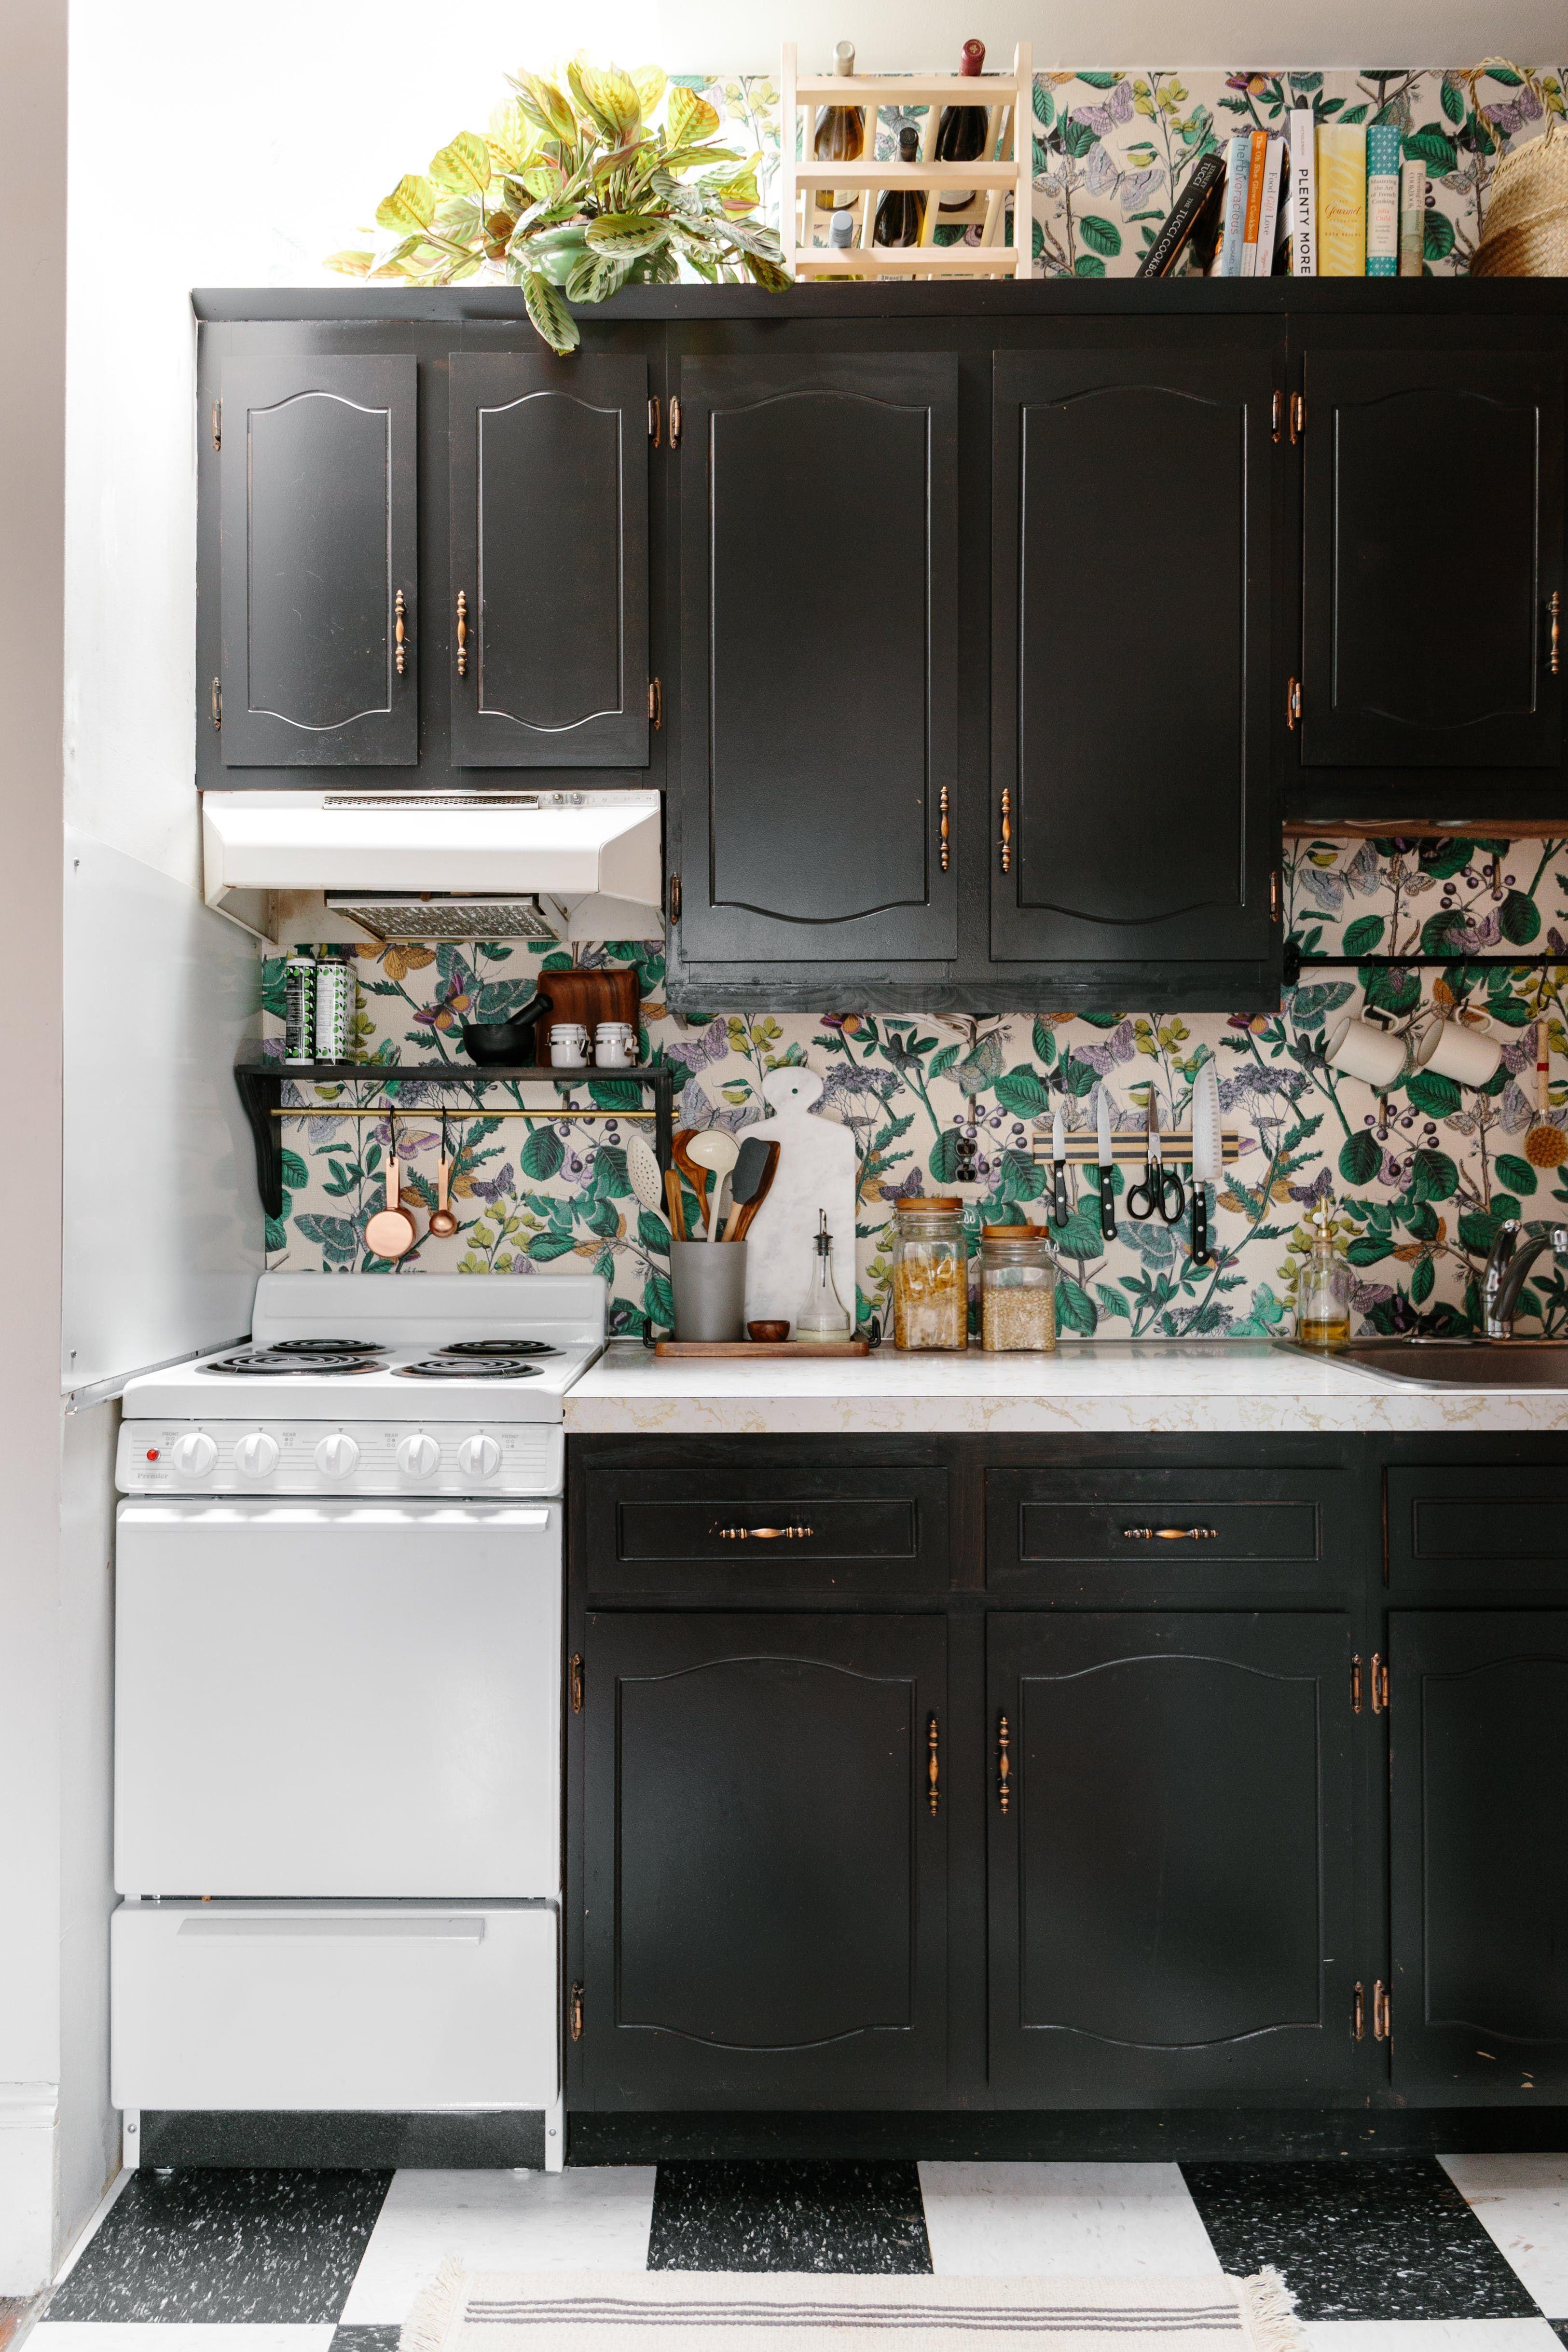 taras budget rental remodel 300 later this rental kitchen is no longer recognizable - Taras Kitchen